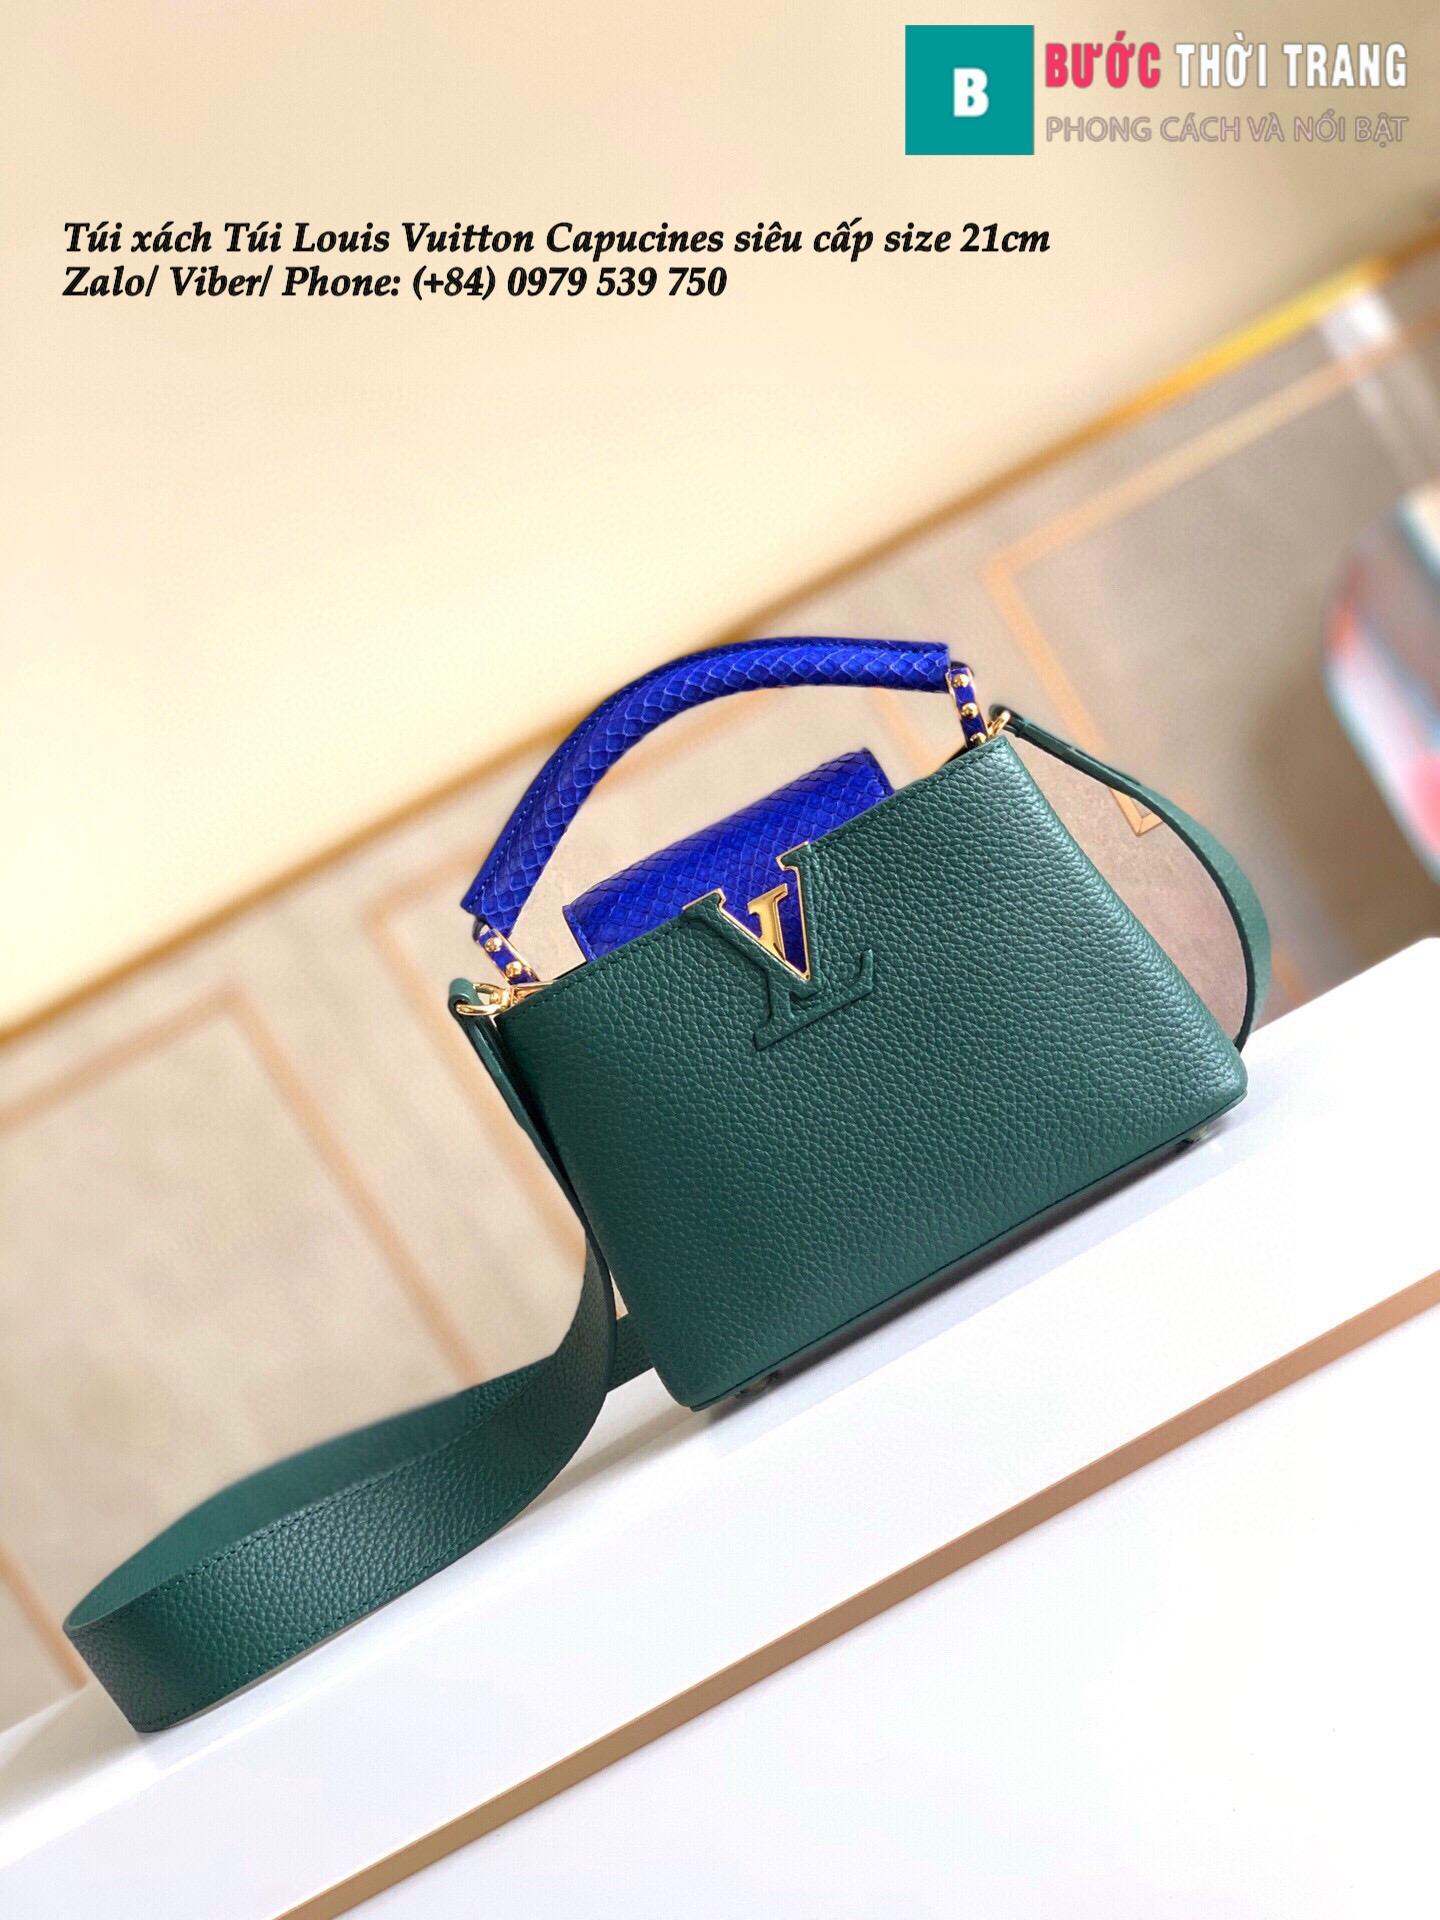 Túi Louis Vuitton Capucines siêu cấp quai da trăn size 21cm – M95509 (10)